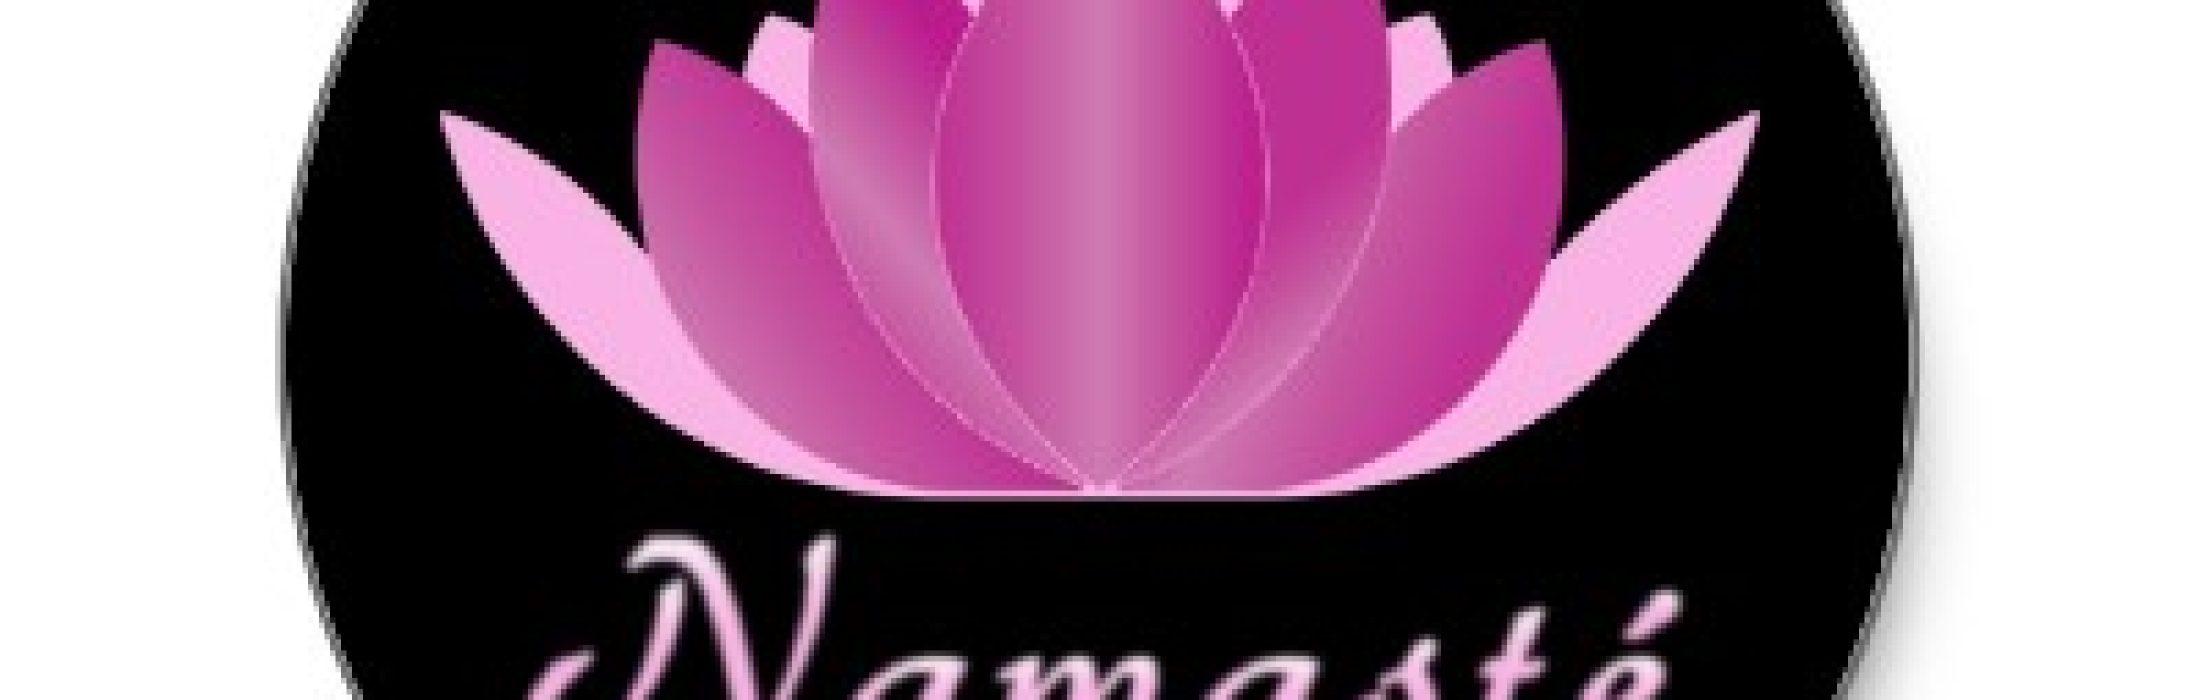 flor_de_namaste_lotus